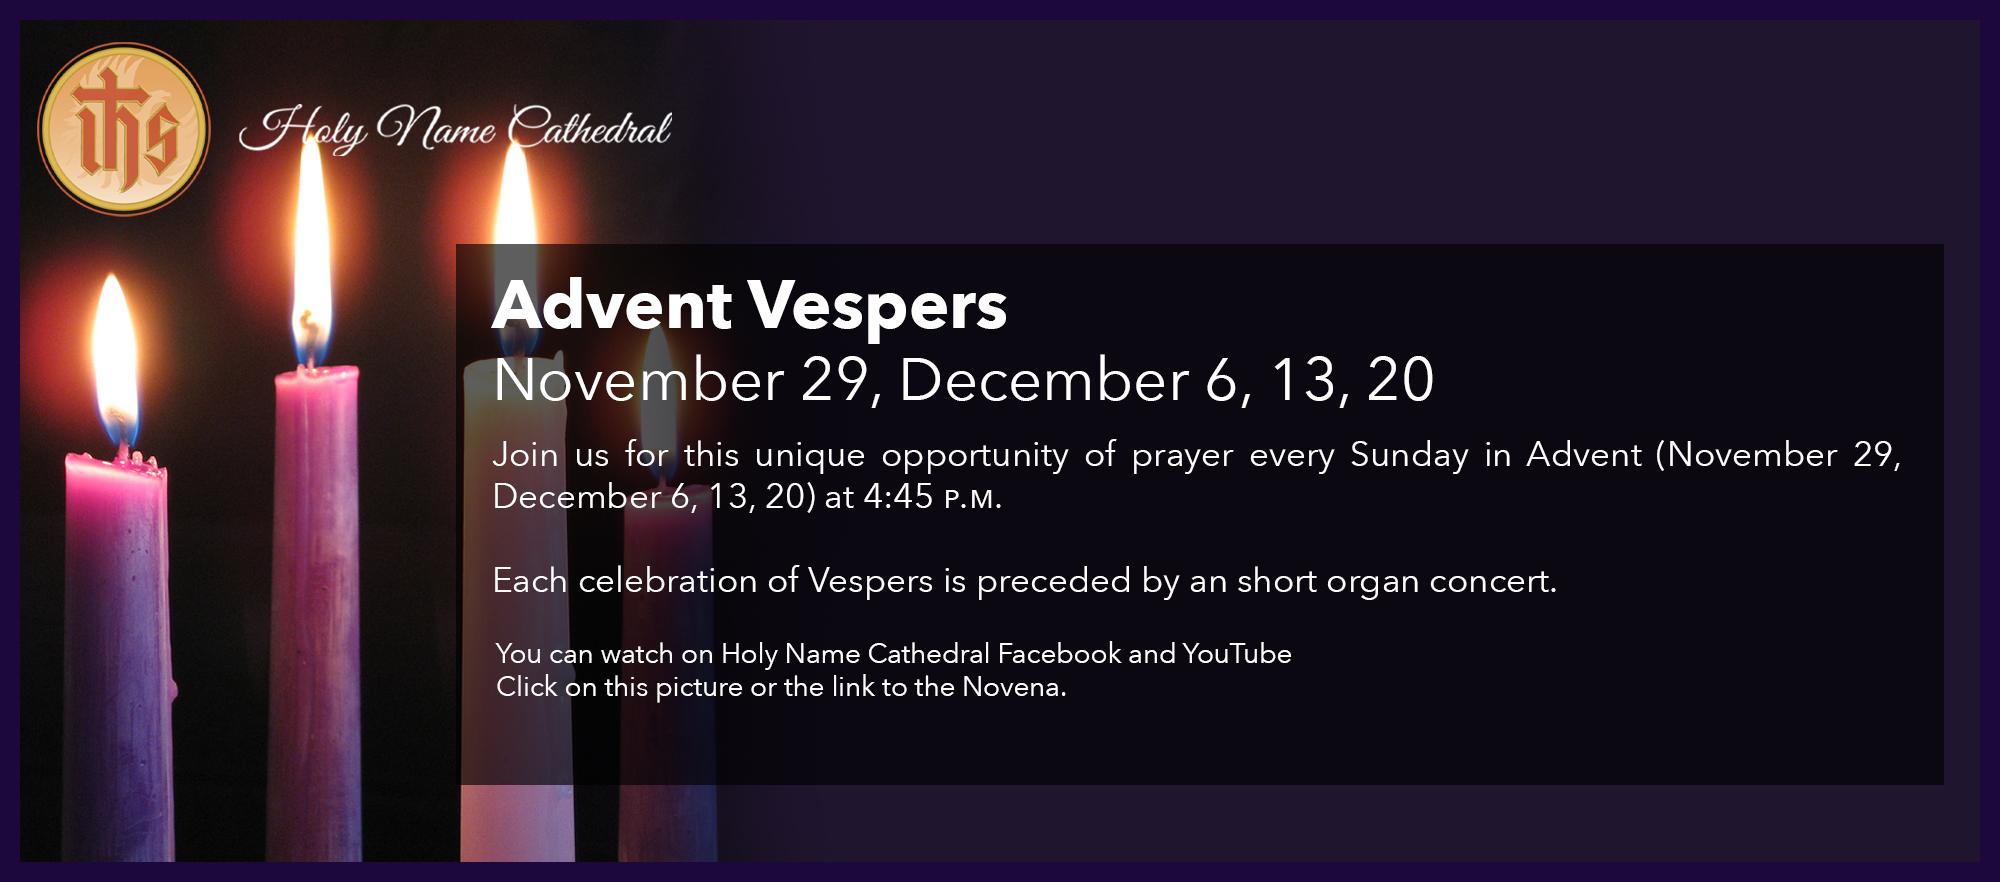 Advent Vespers